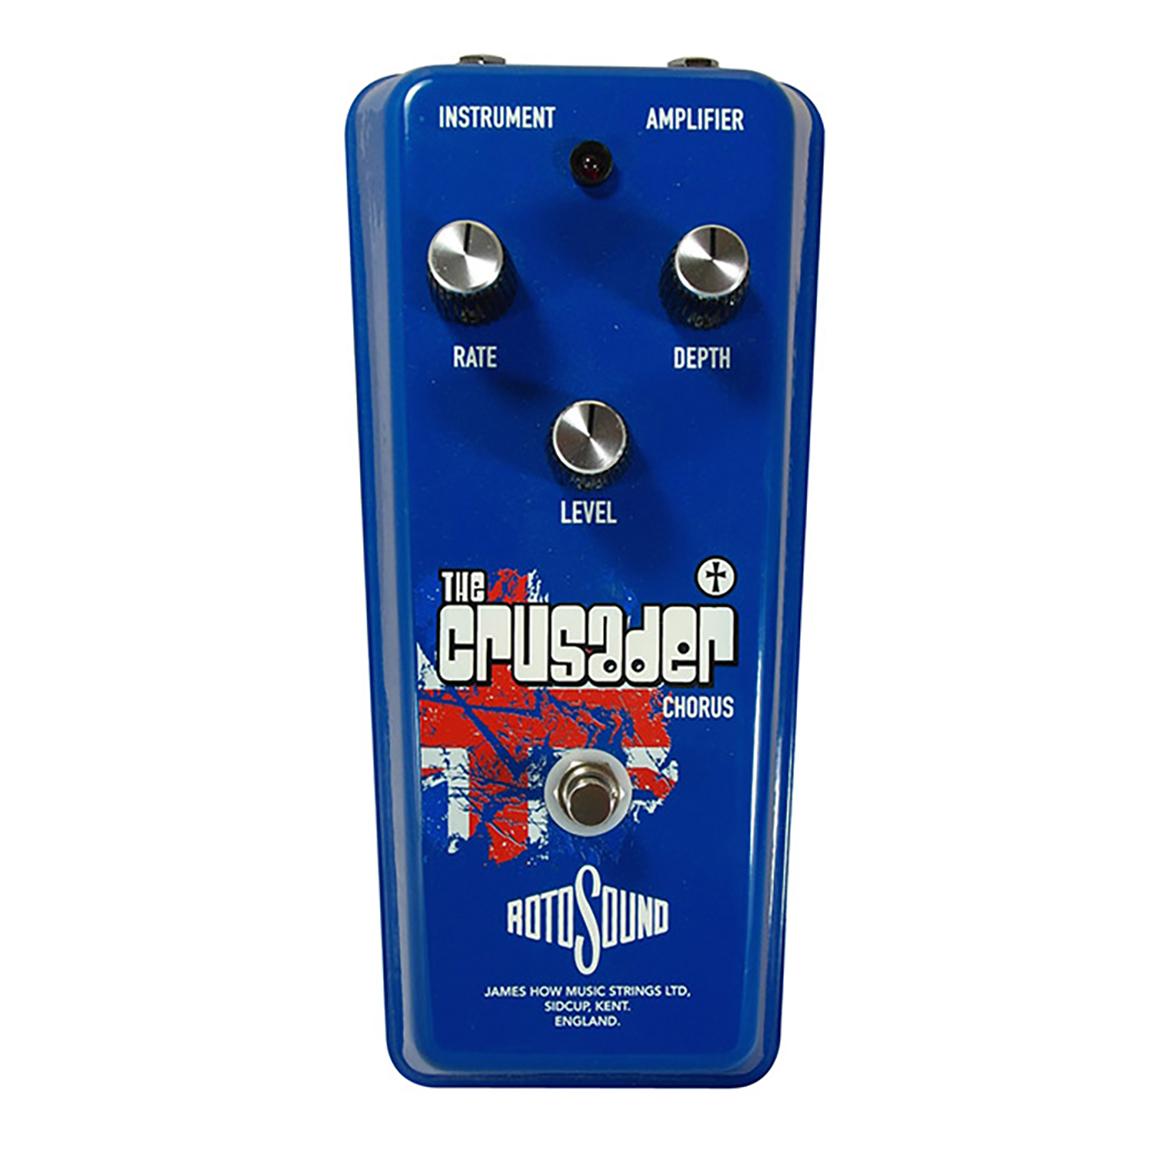 Rotosound Crusader Chorus effects pedal